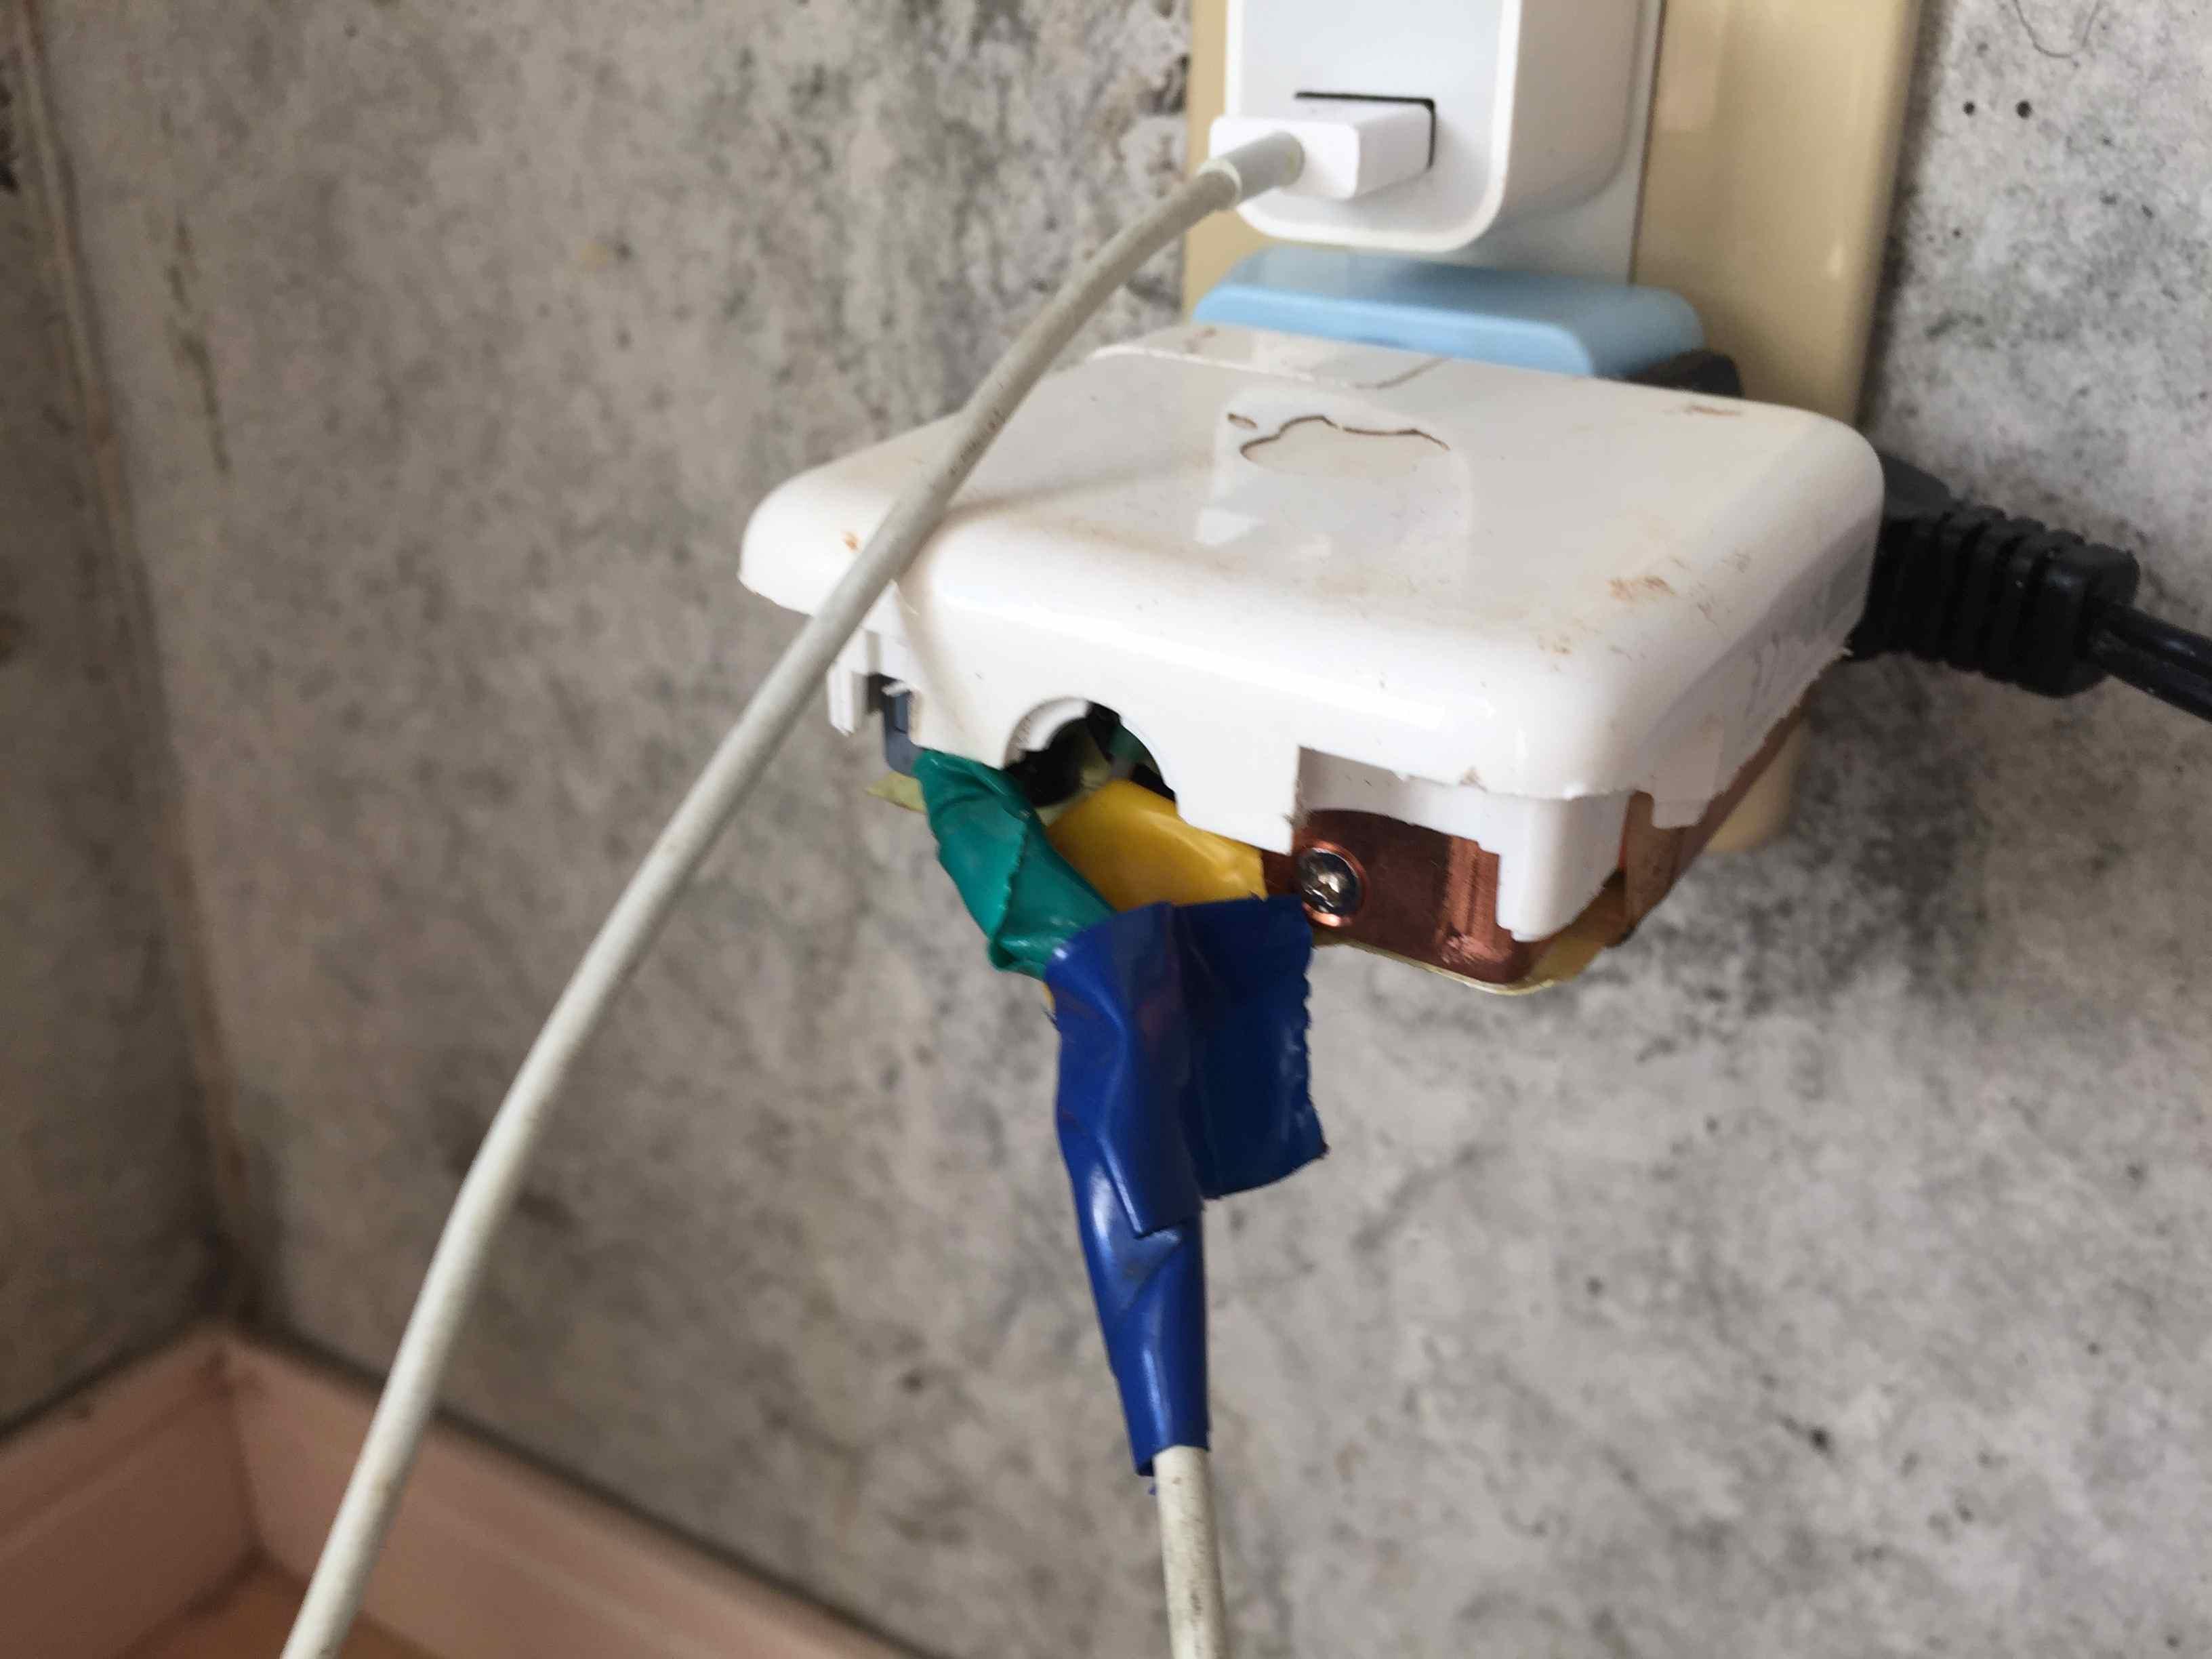 Macbook airの電源アダプタが断線したので修理してみた